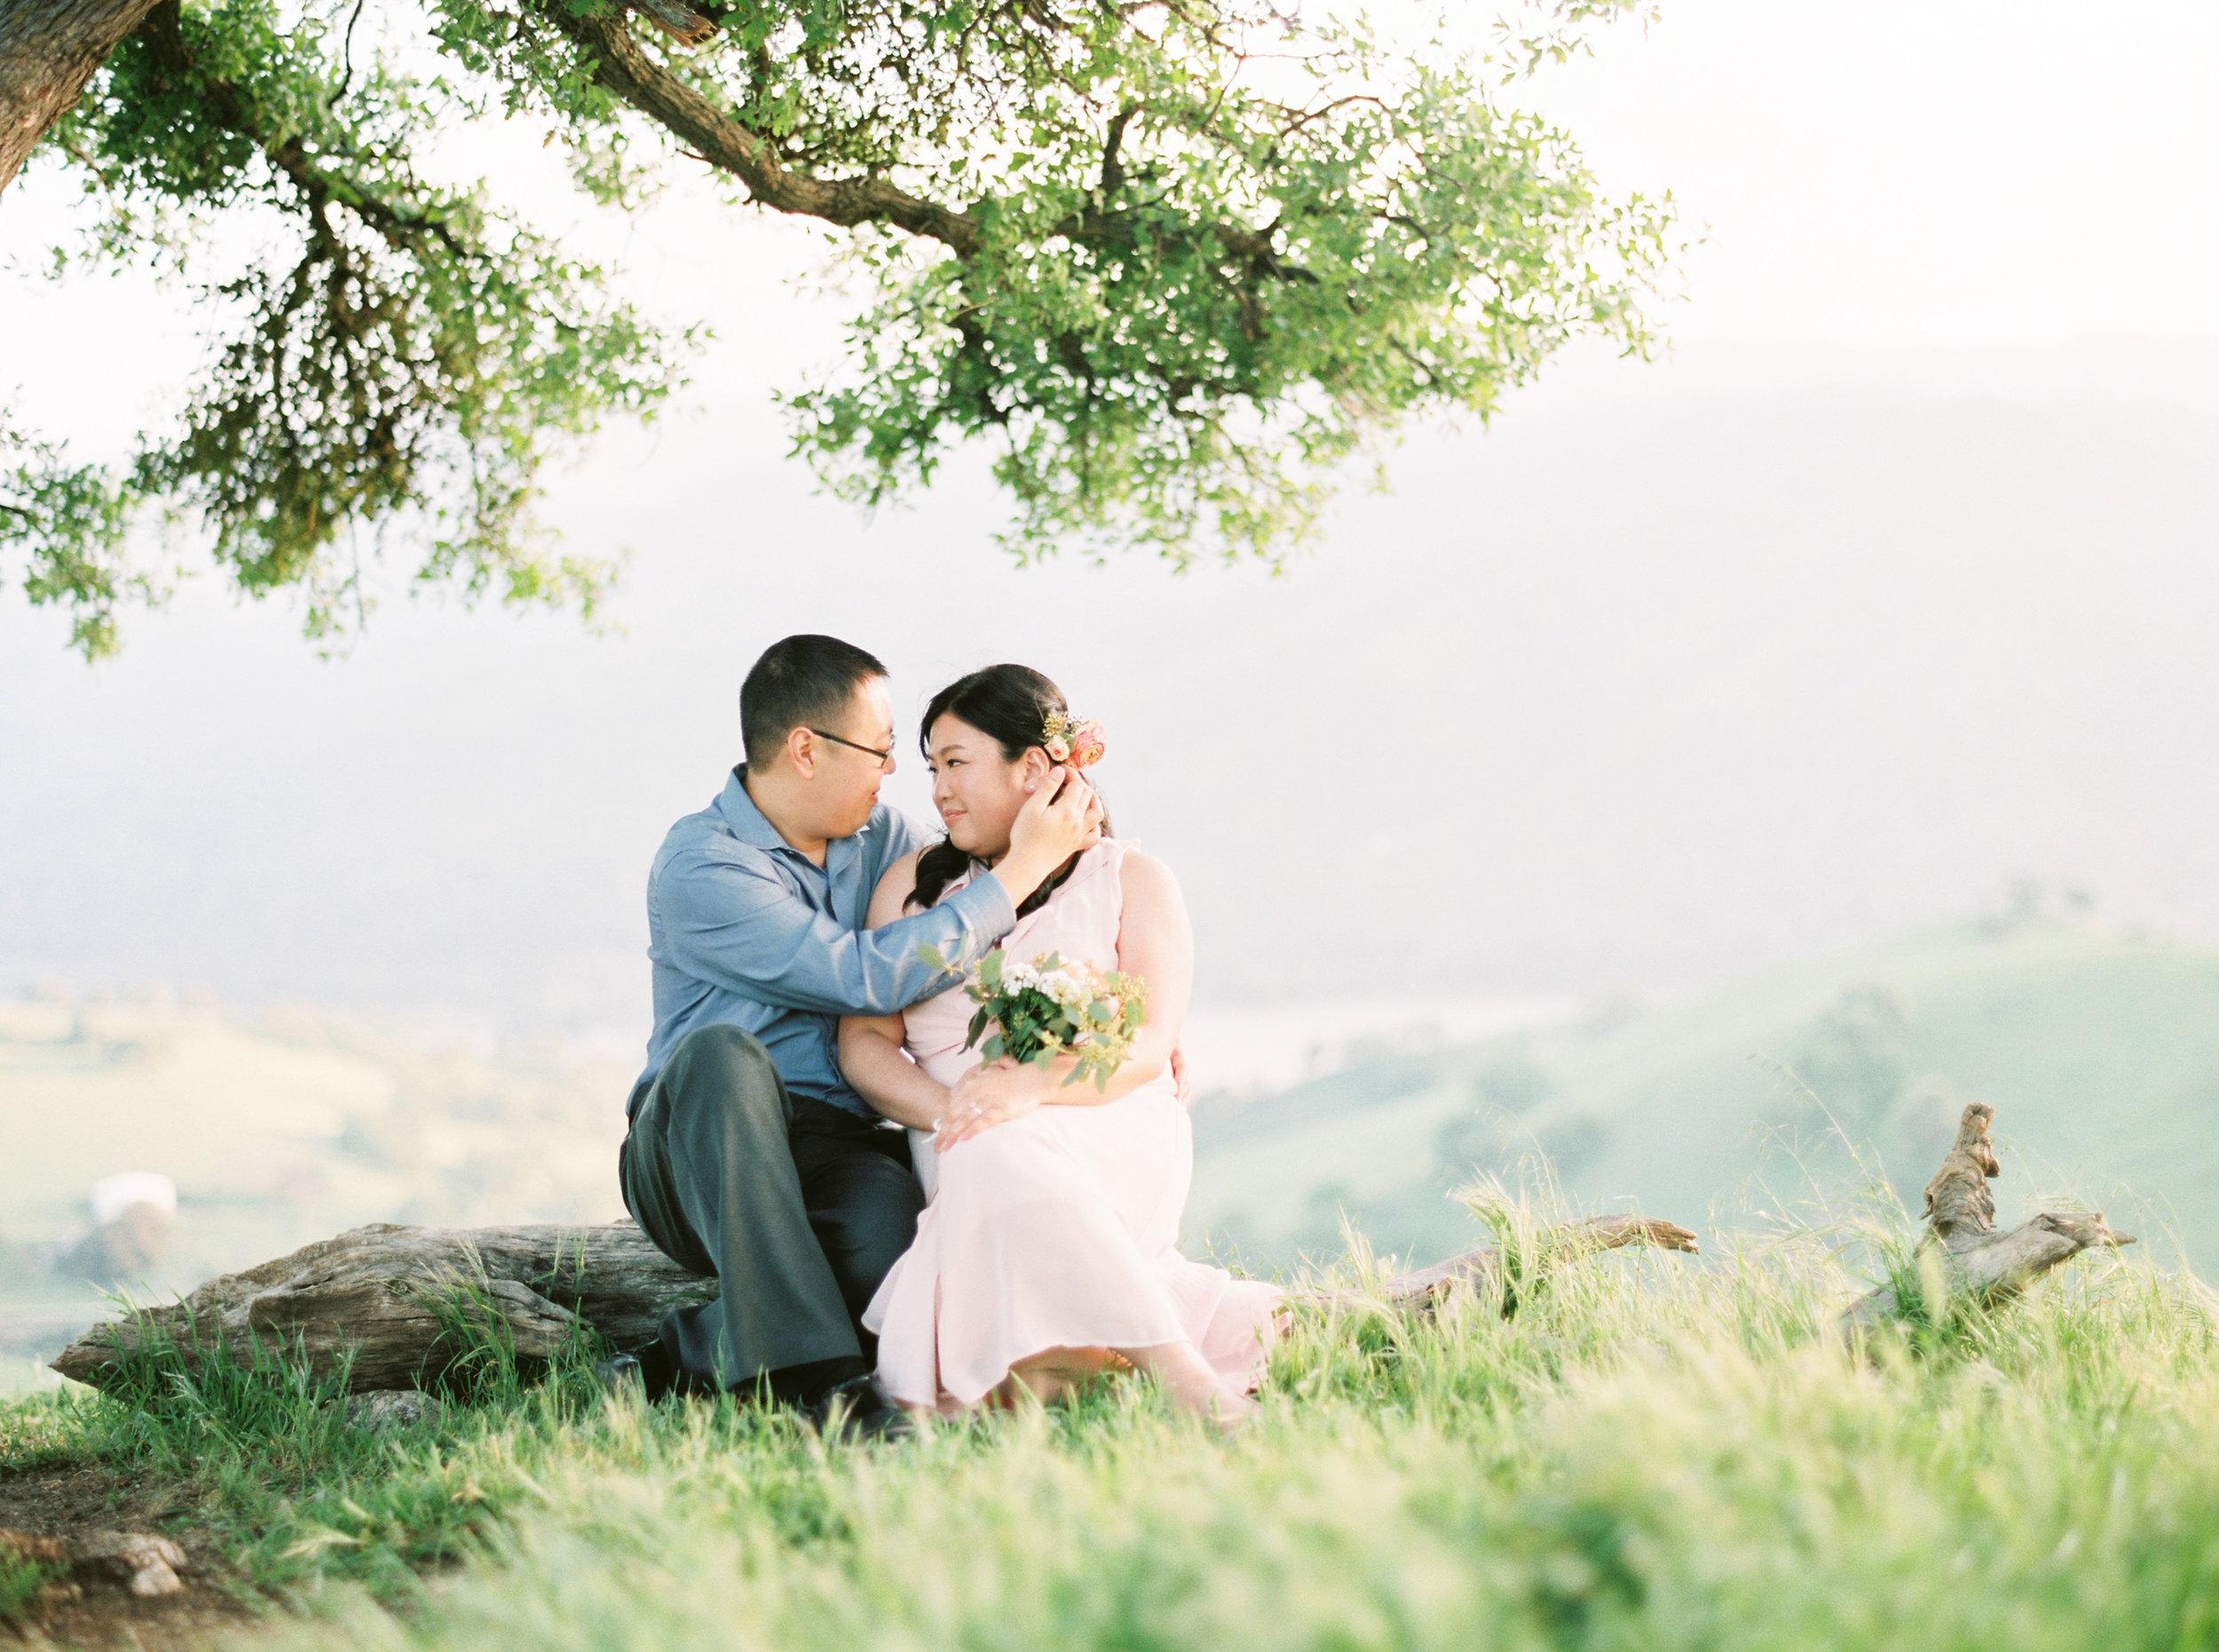 del-valle-livermore-bay-area-wedding-photographer-28.jpg